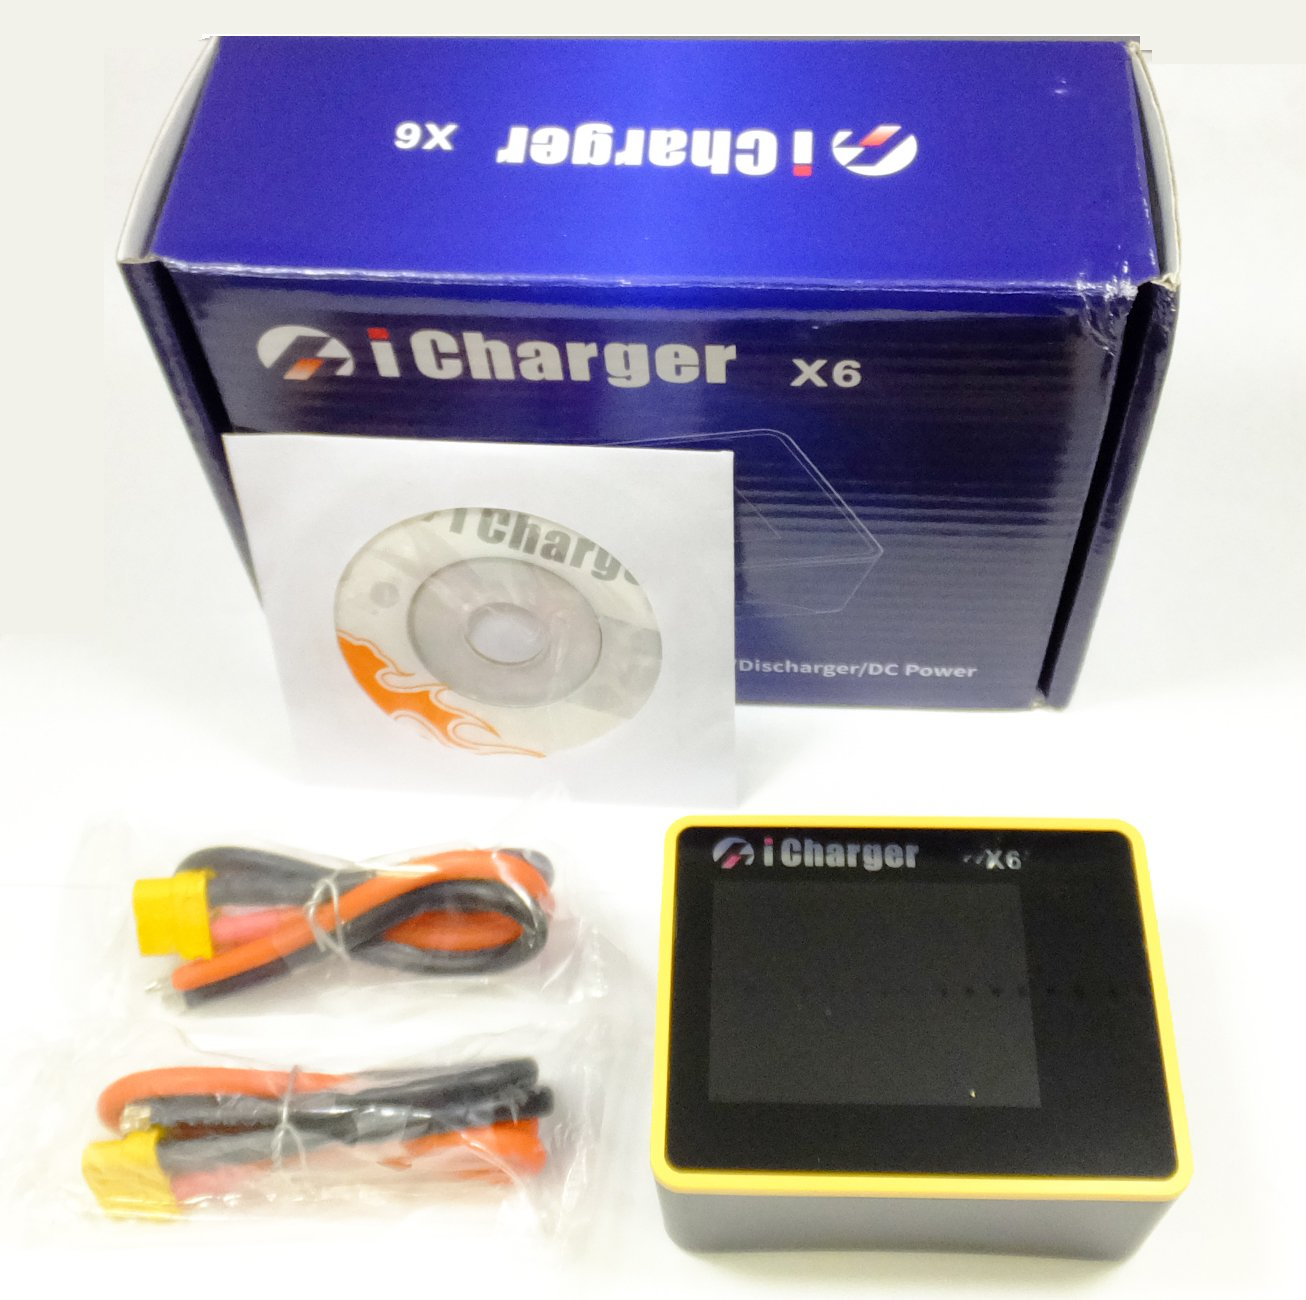 MALTA★iCharger X6 小型超高性能チャージャー 1~6CELL 30A/800W B07F3YKKNT